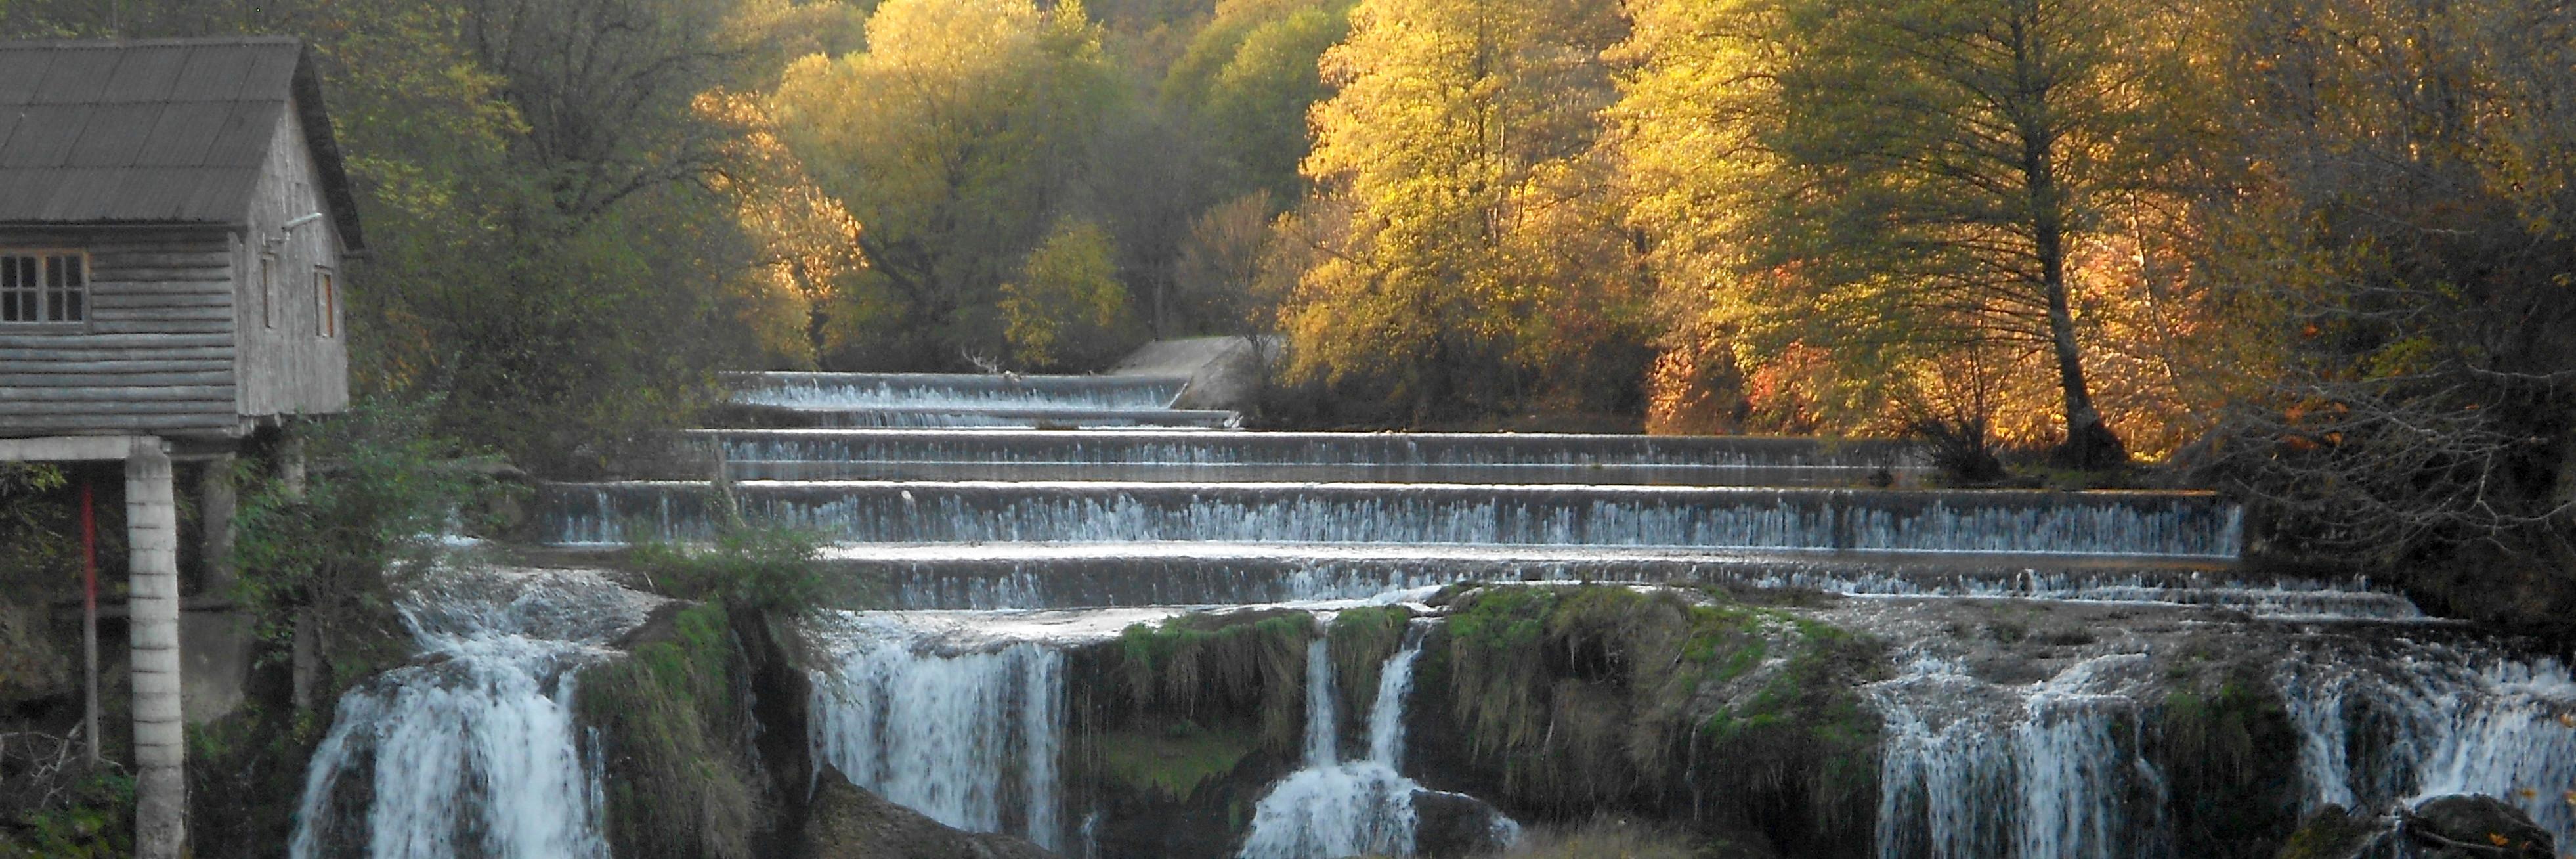 Водопад Костелский бук